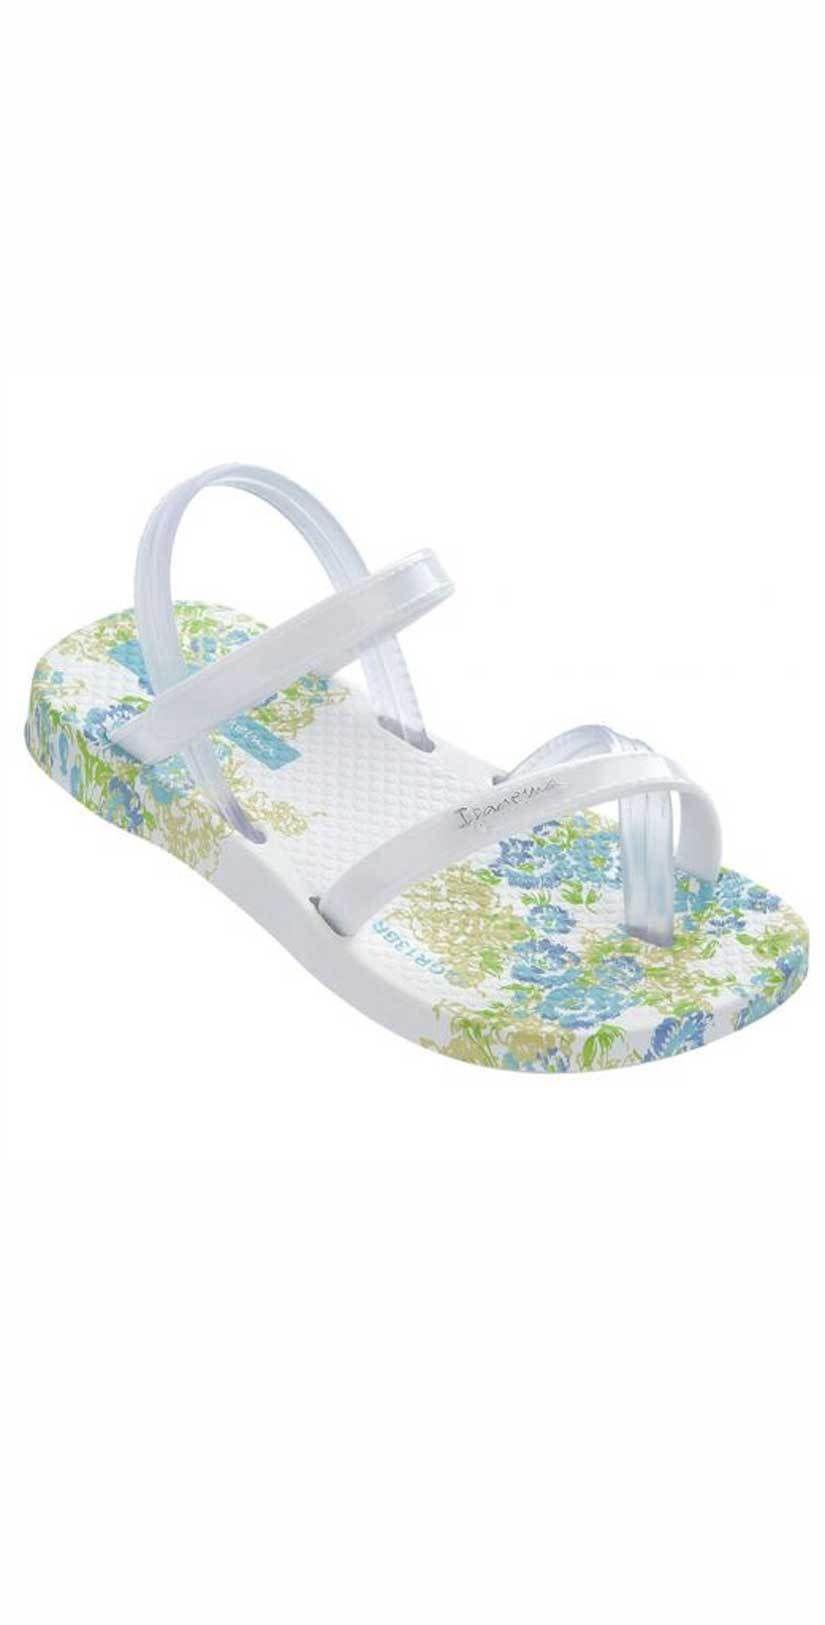 98572f779881c Ipanema Baby Blanket II Sandals in White 81207-20790-WHT